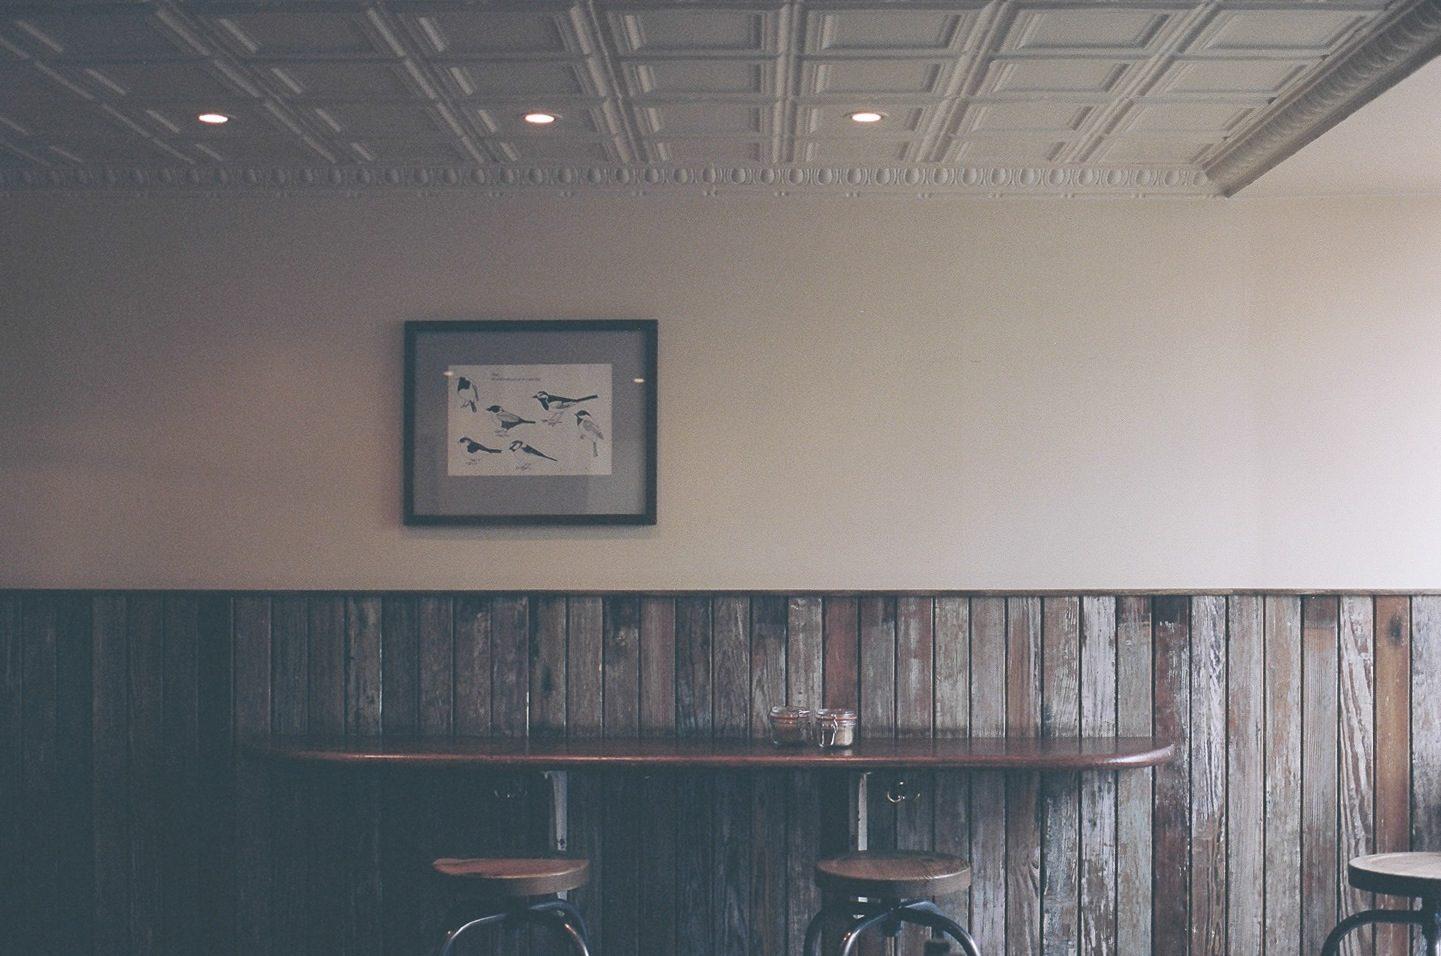 cuadro, pájaros, luces, bar, asientos - Fondos de Pantalla HD - professor-falken.com